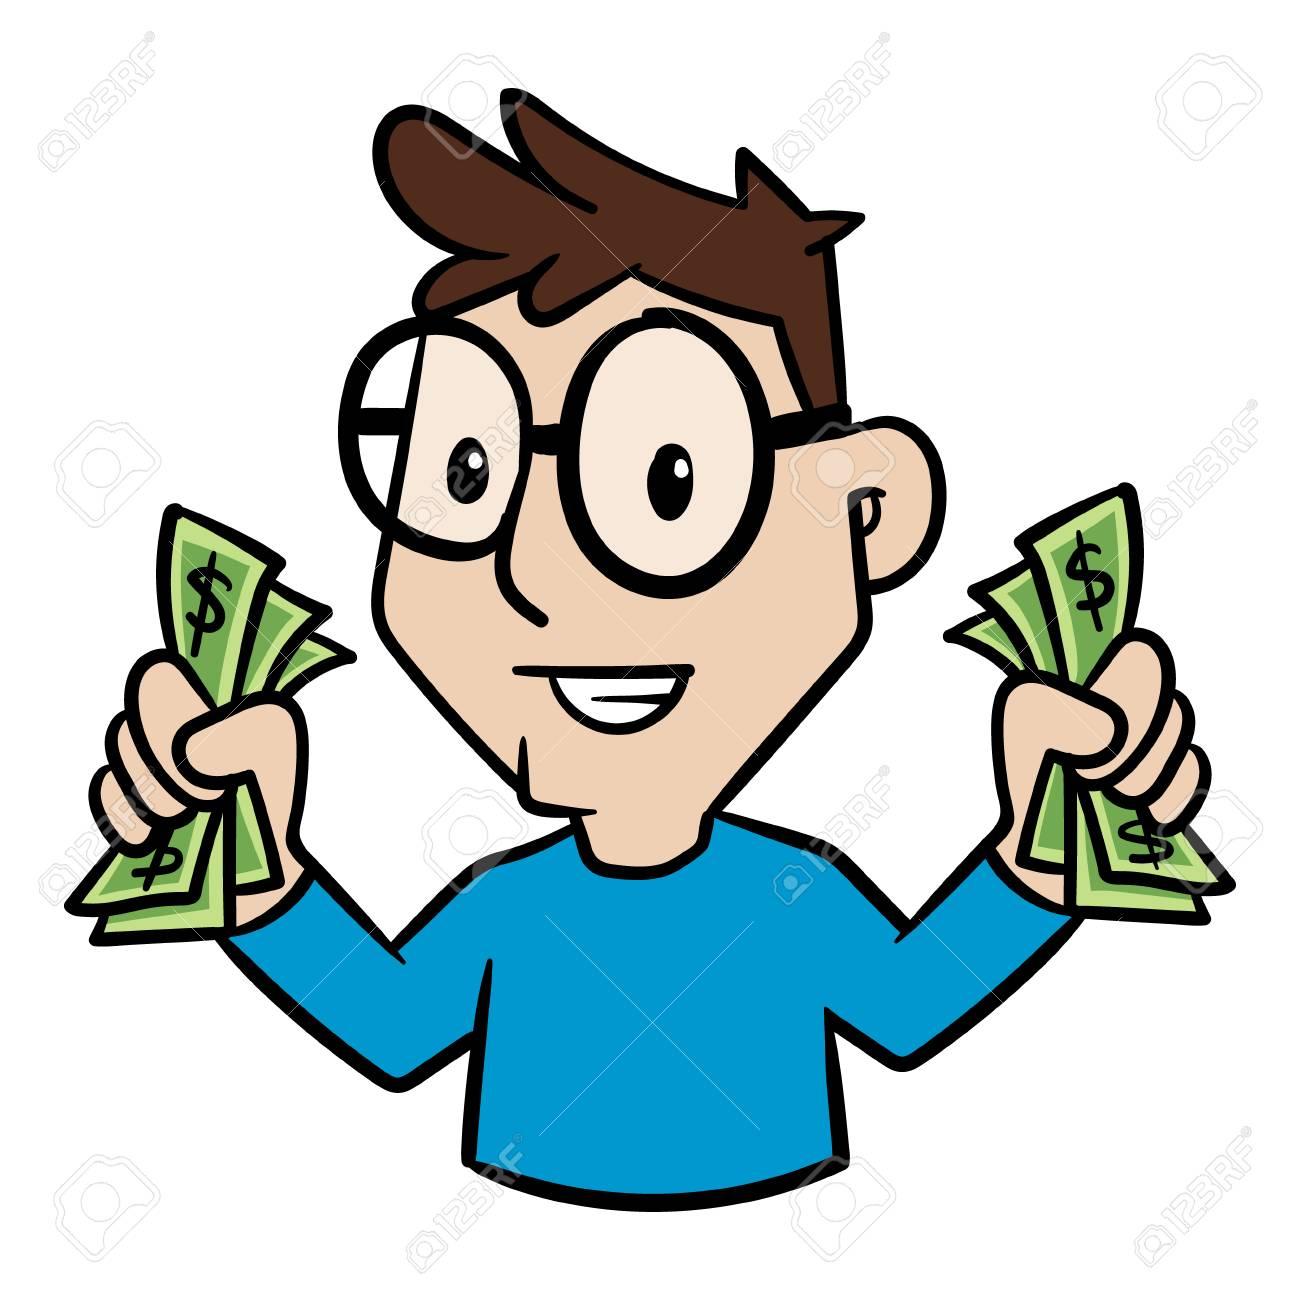 cartoon person holding cash money vector illustration royalty free rh 123rf com make money clipart Education Clip Art